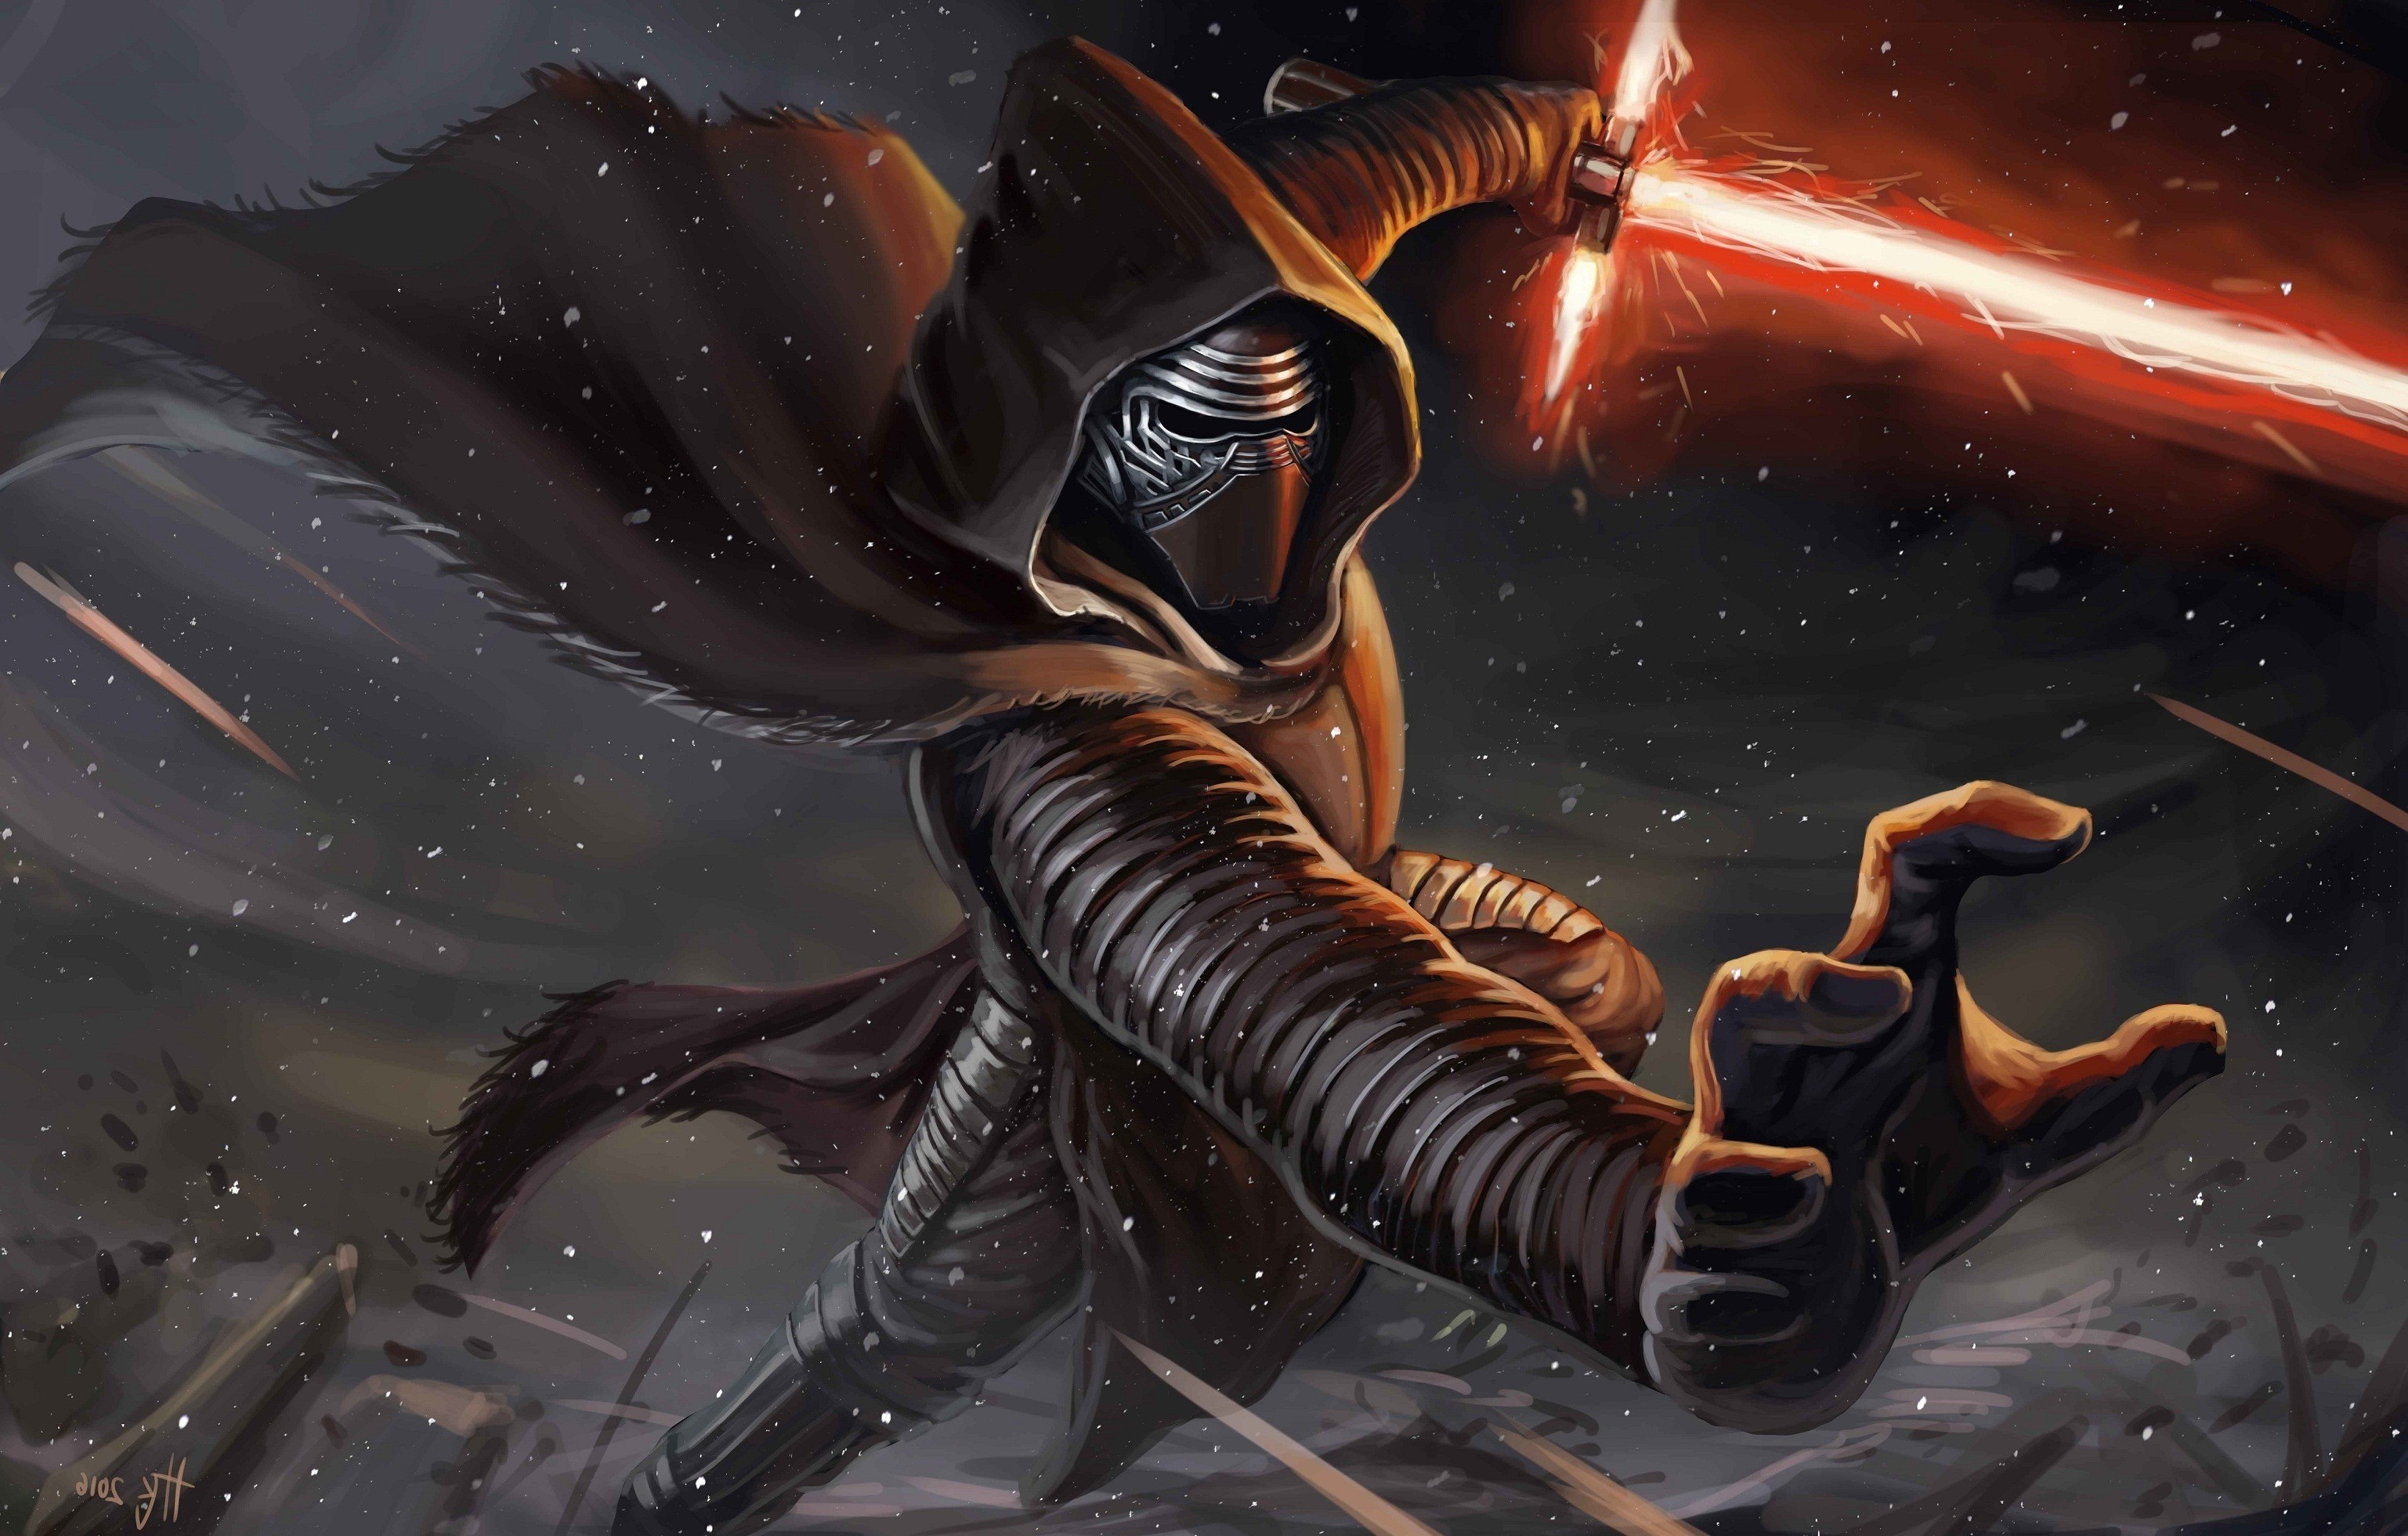 Kylo Ren, Star Wars, Artwork Wallpapers HD / Desktop and Mobile Backgrounds